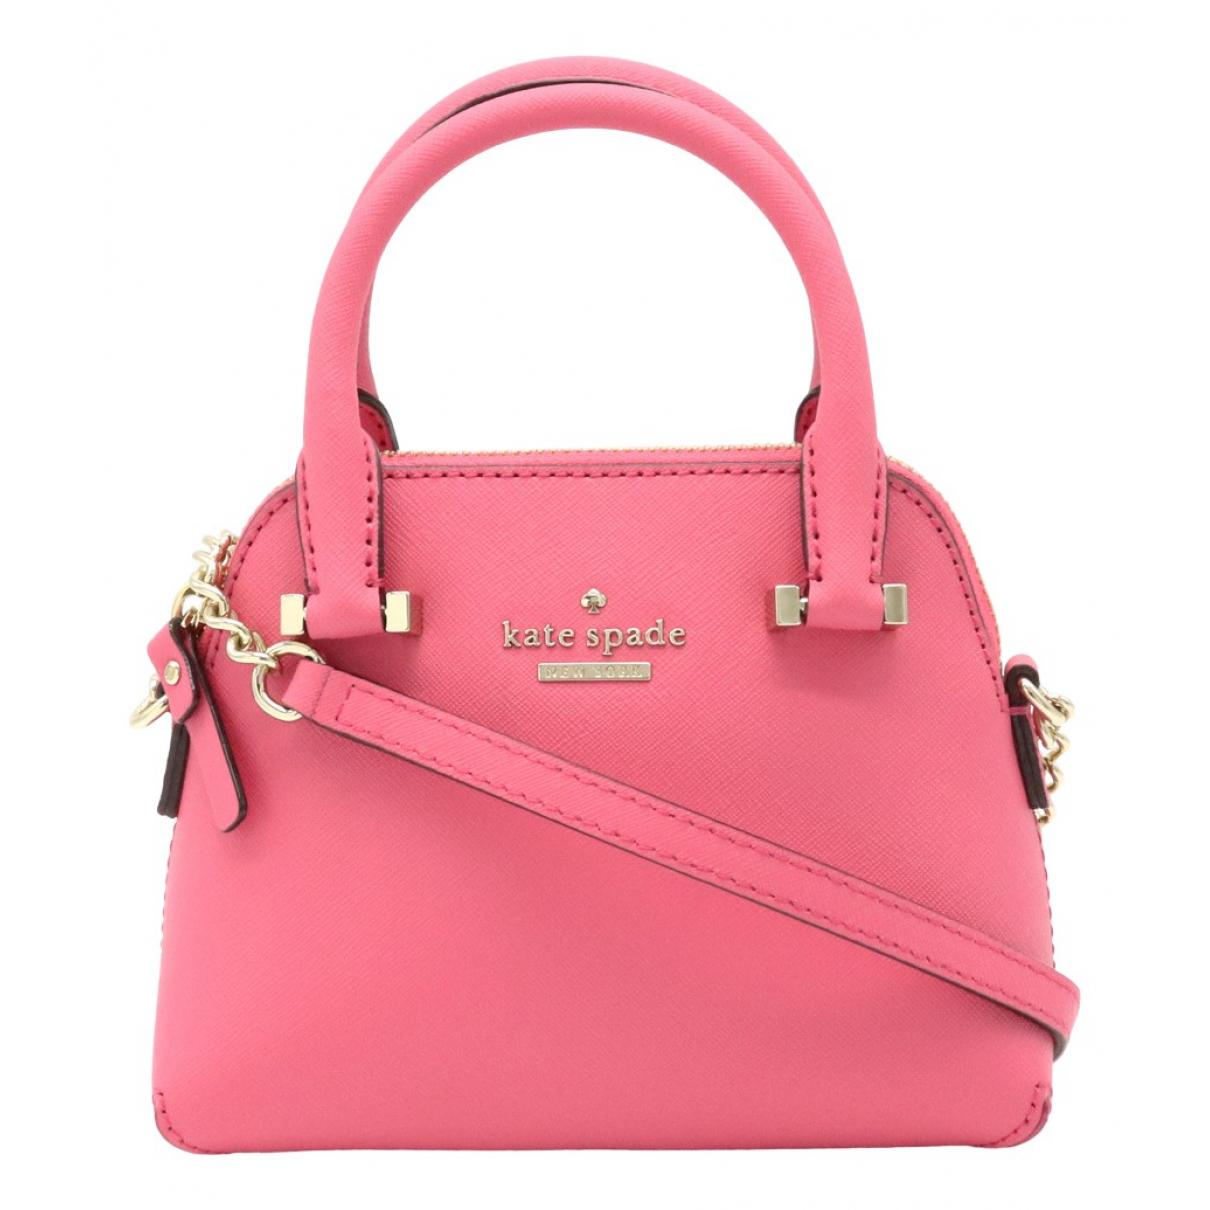 Kate Spade N Pink Leather handbag for Women N